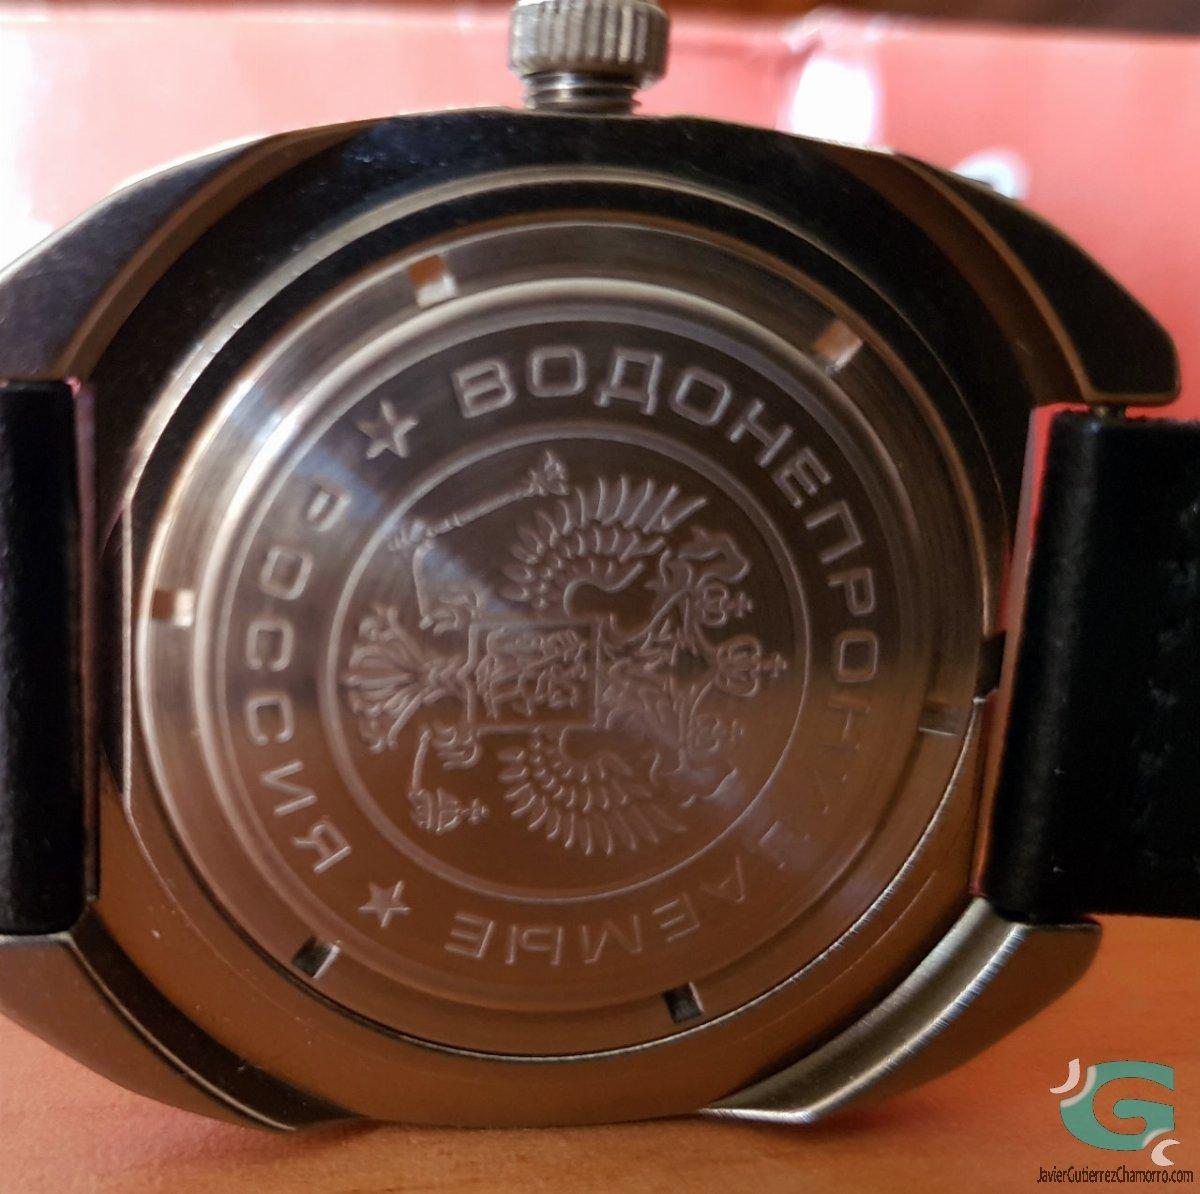 Vostok Komandirskie 861033